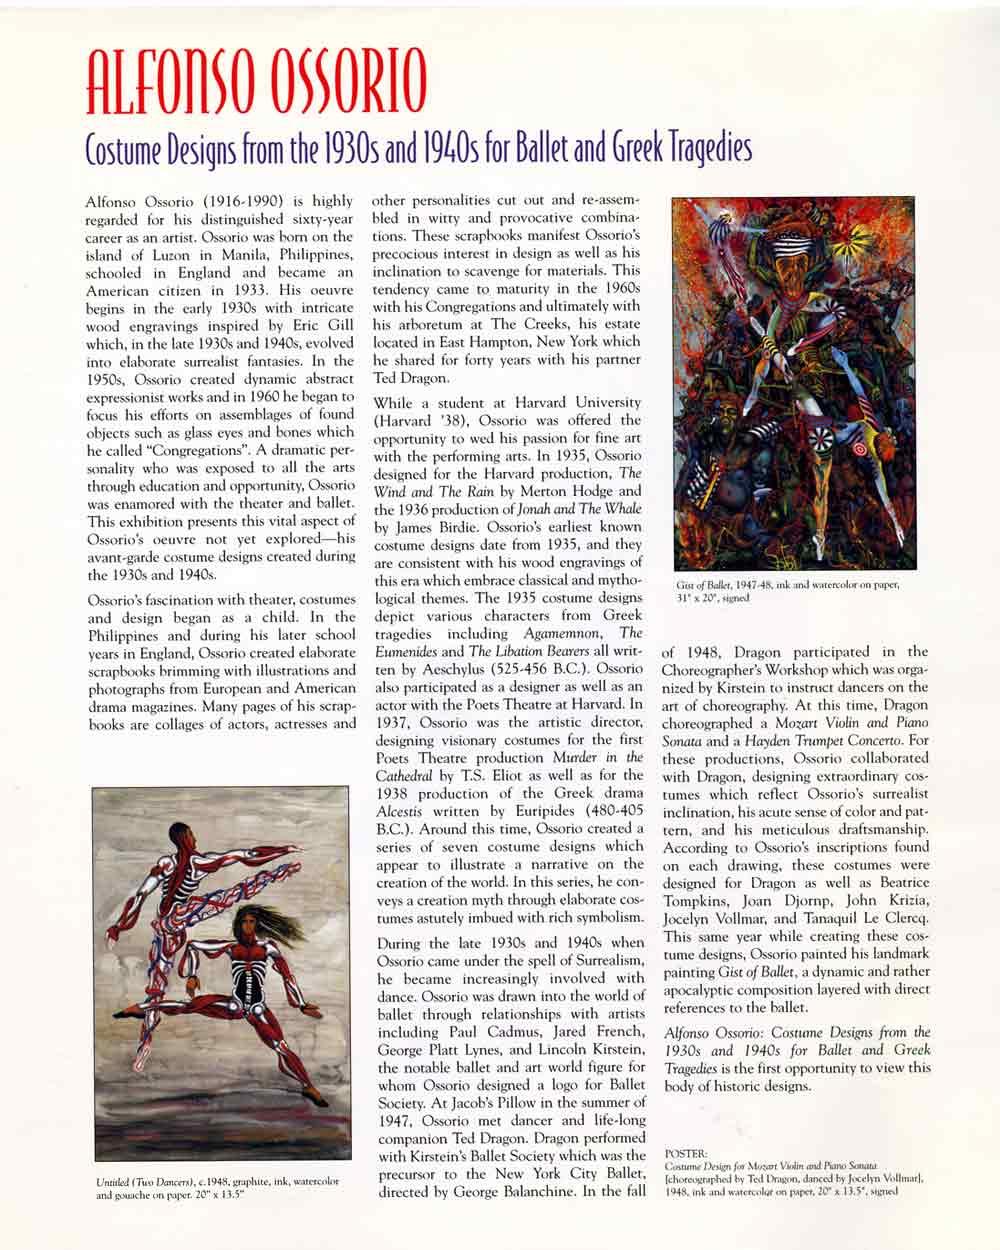 Alfonso Ossorio: Costume Designs, flyer, pg 2